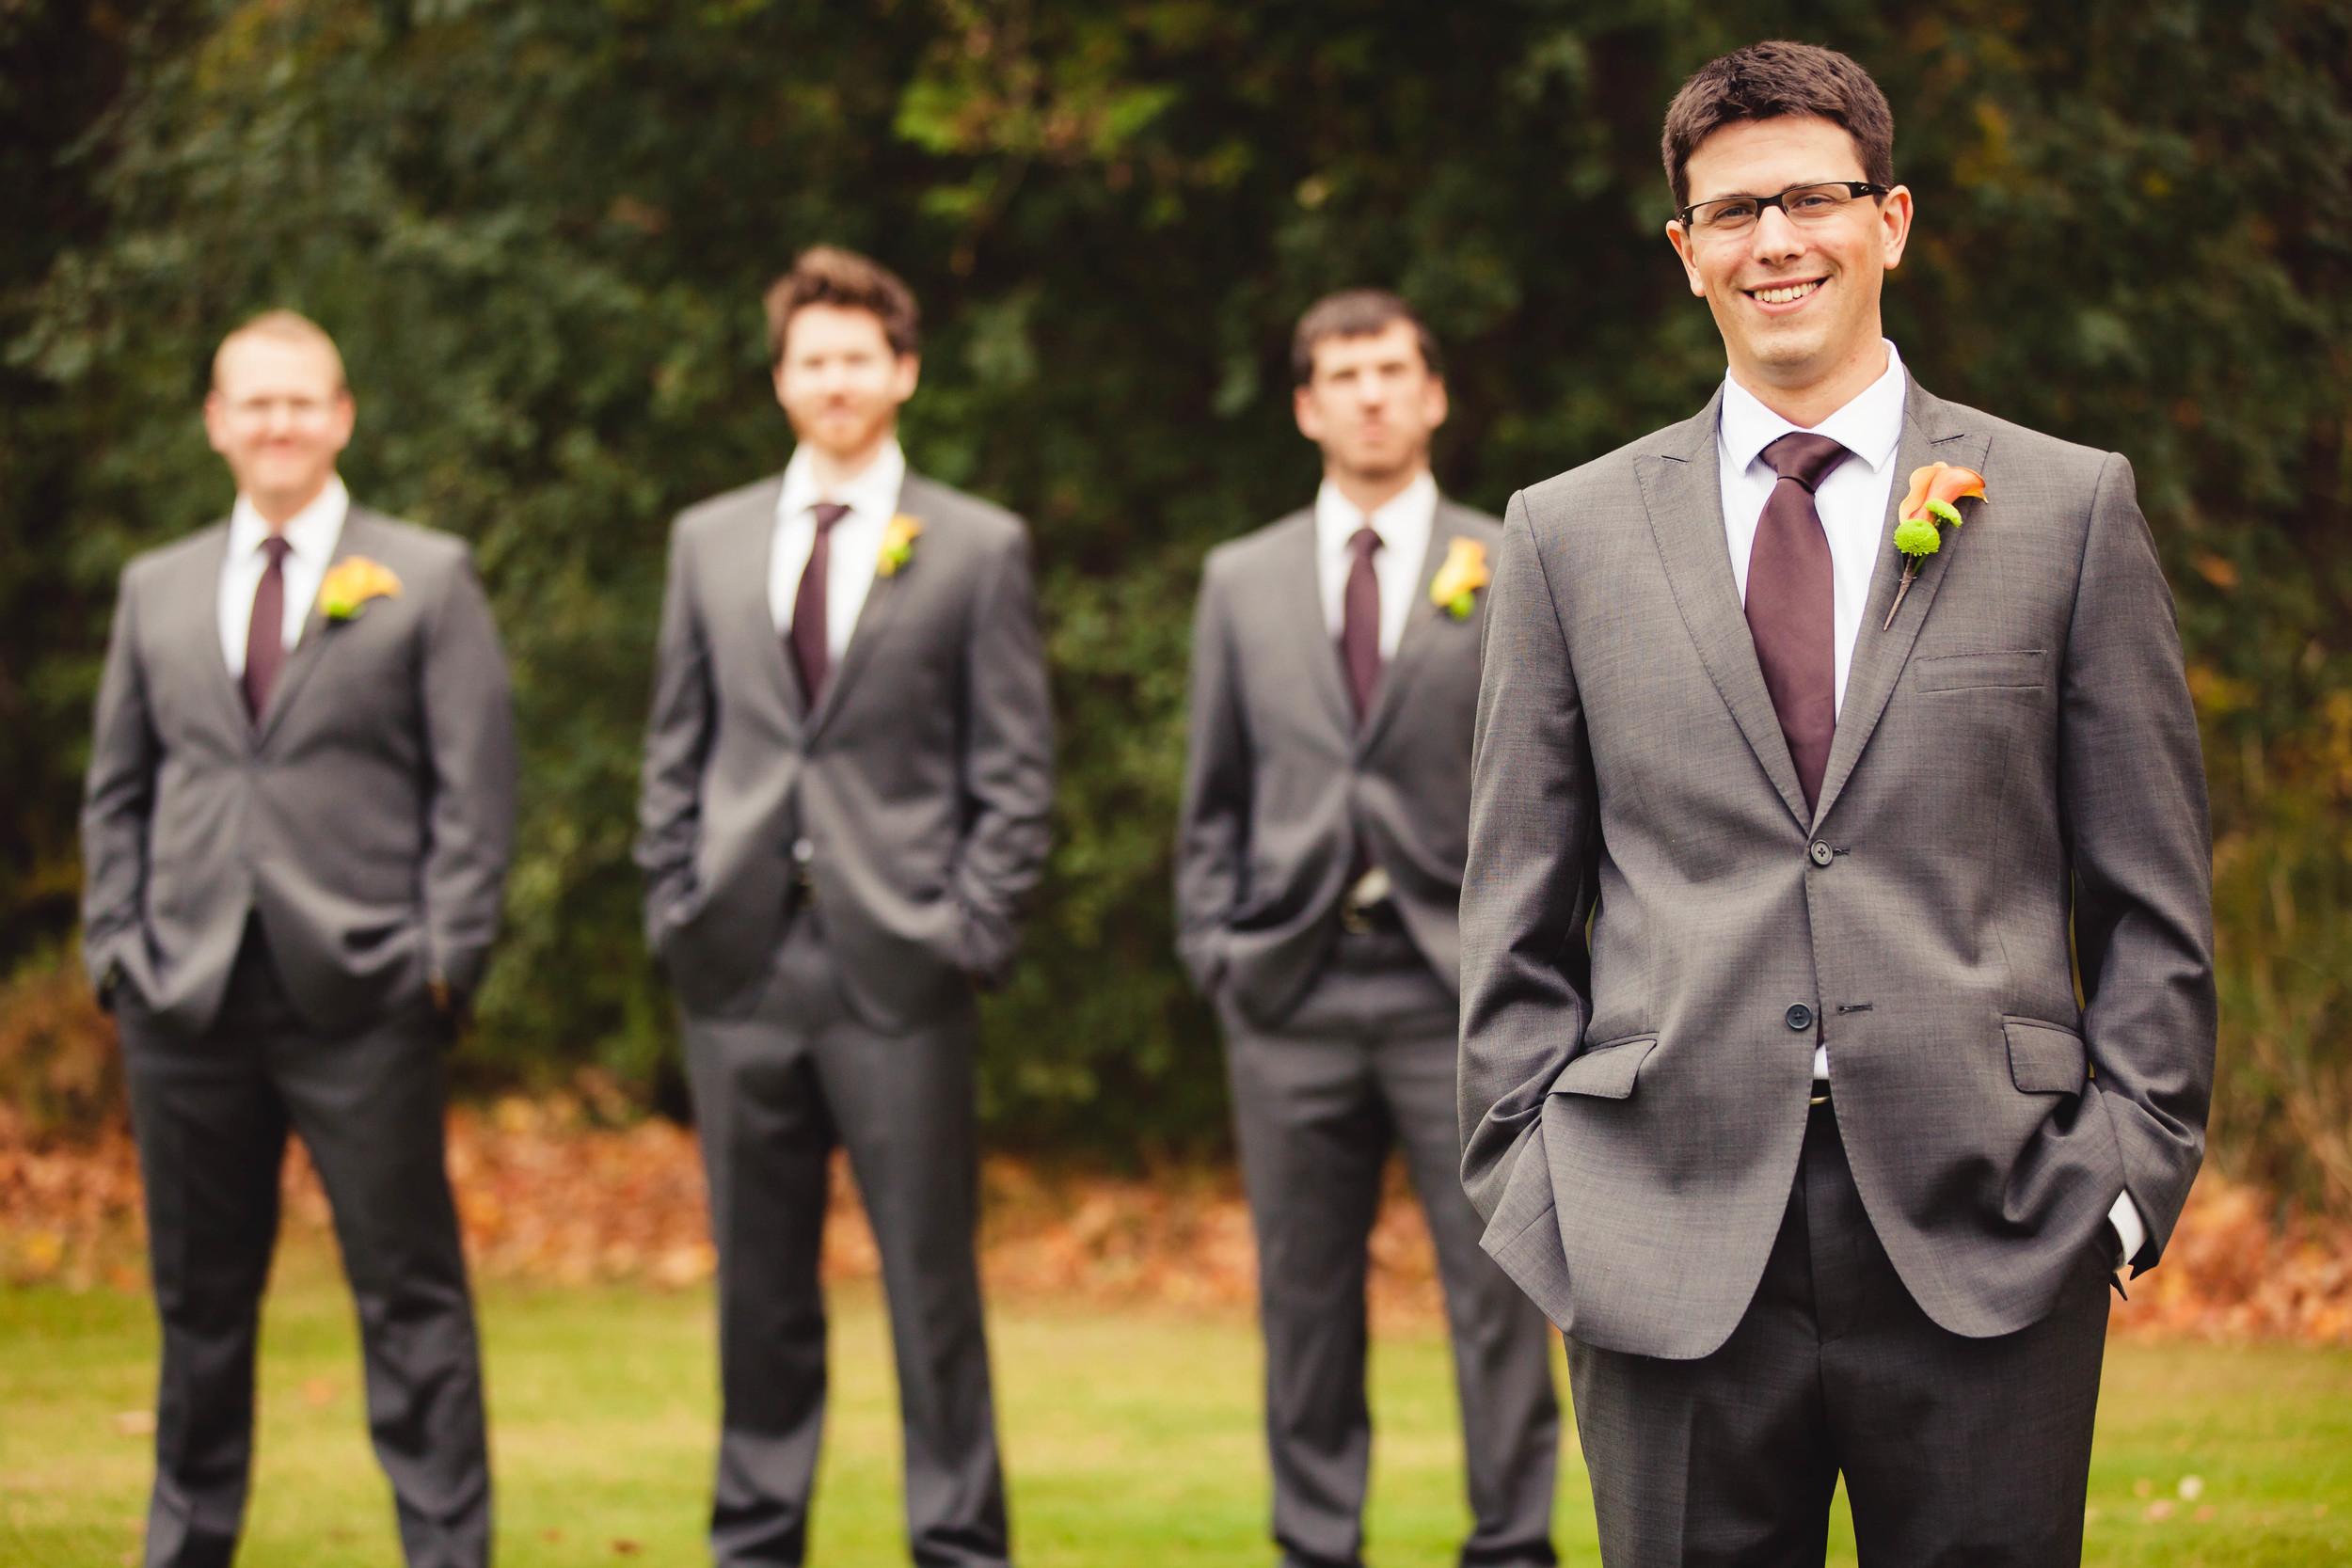 toronto_wedding_photography-Steph_Troy-5.jpg